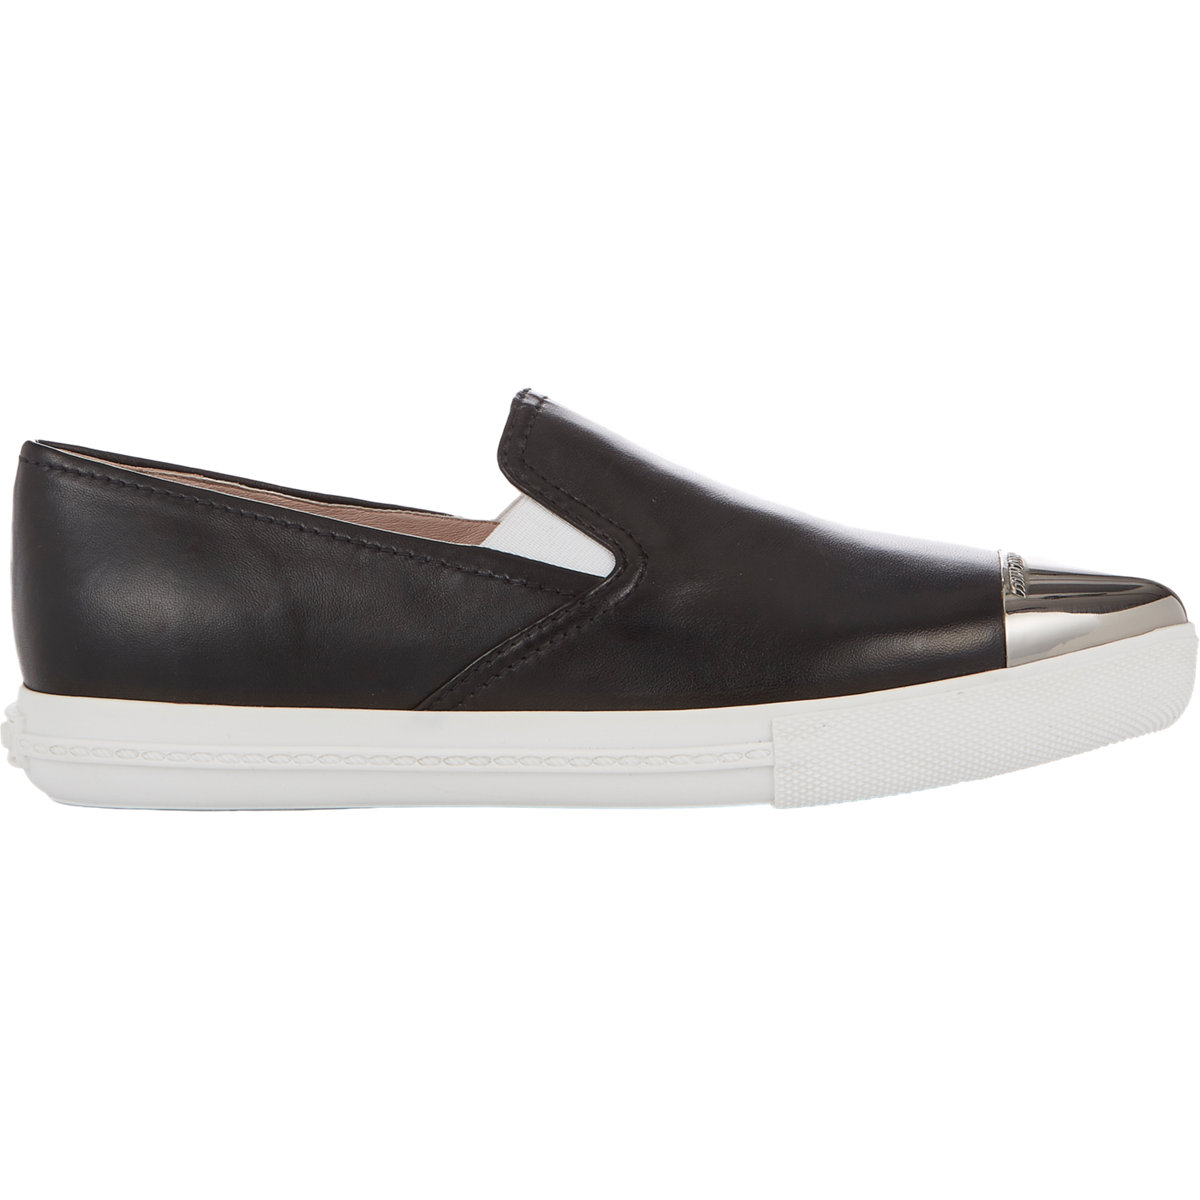 Miu Miu Metallic-Toe Sport Sneakers at Barneys.com